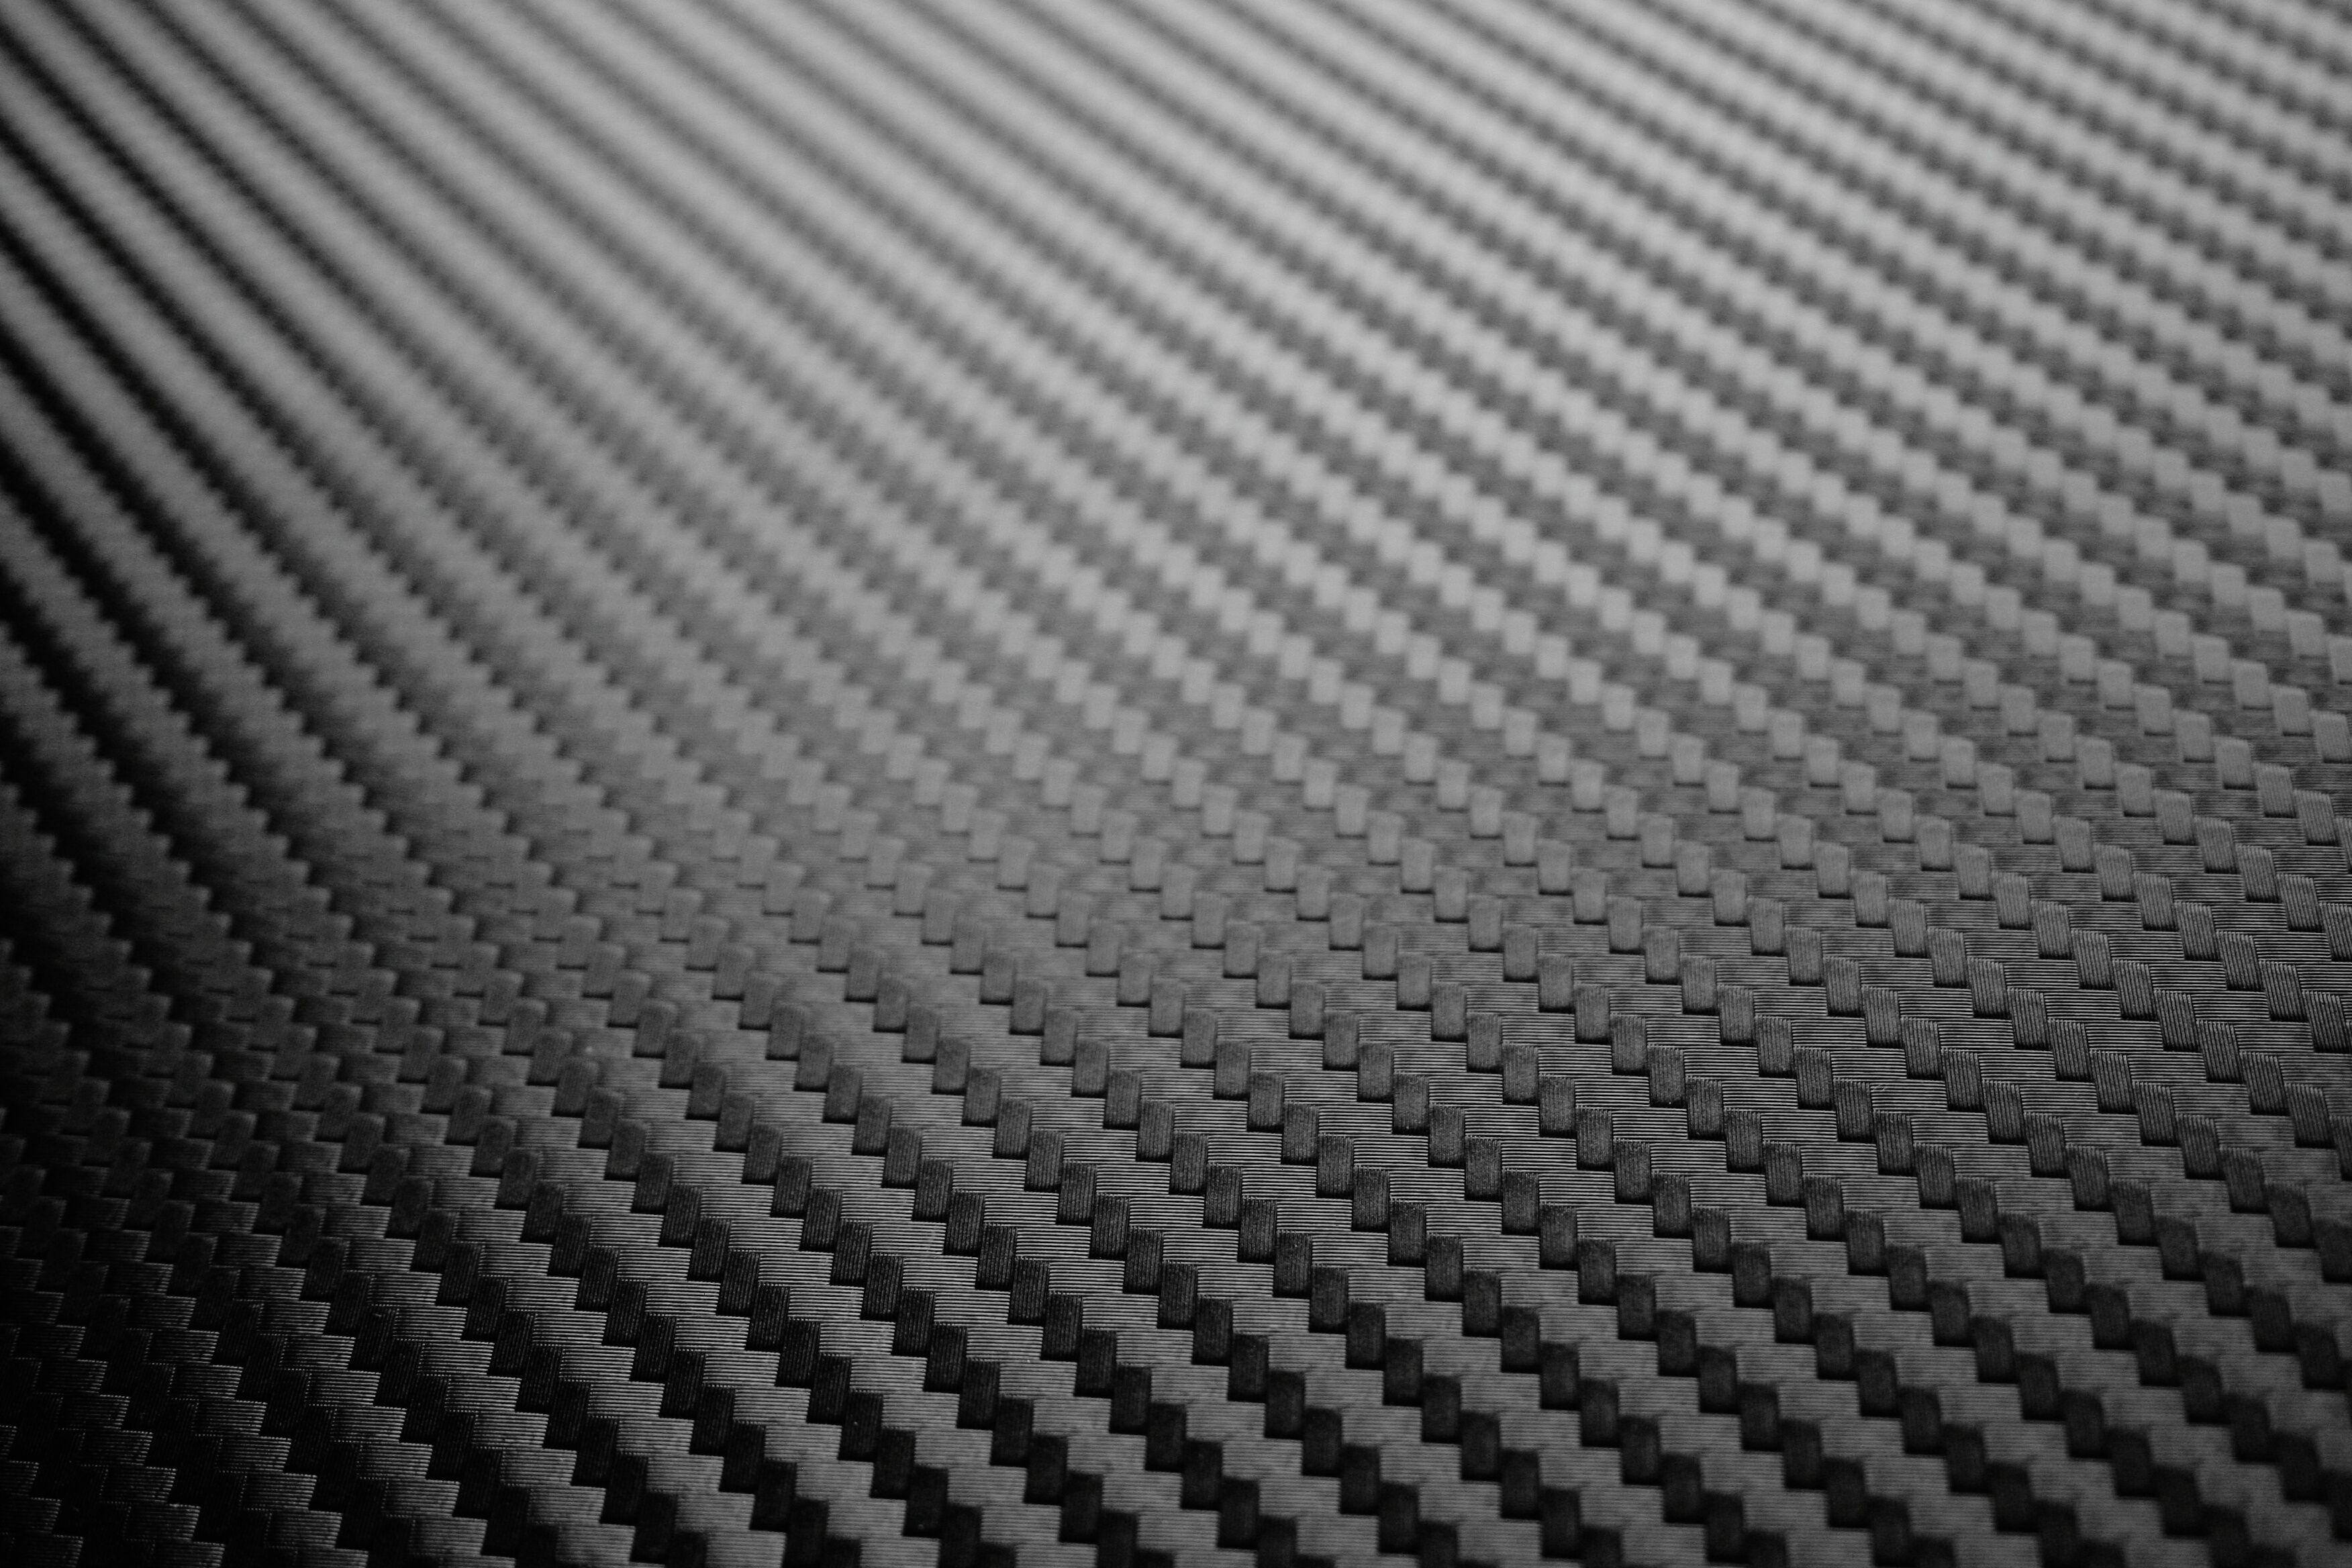 Carbon Film Science